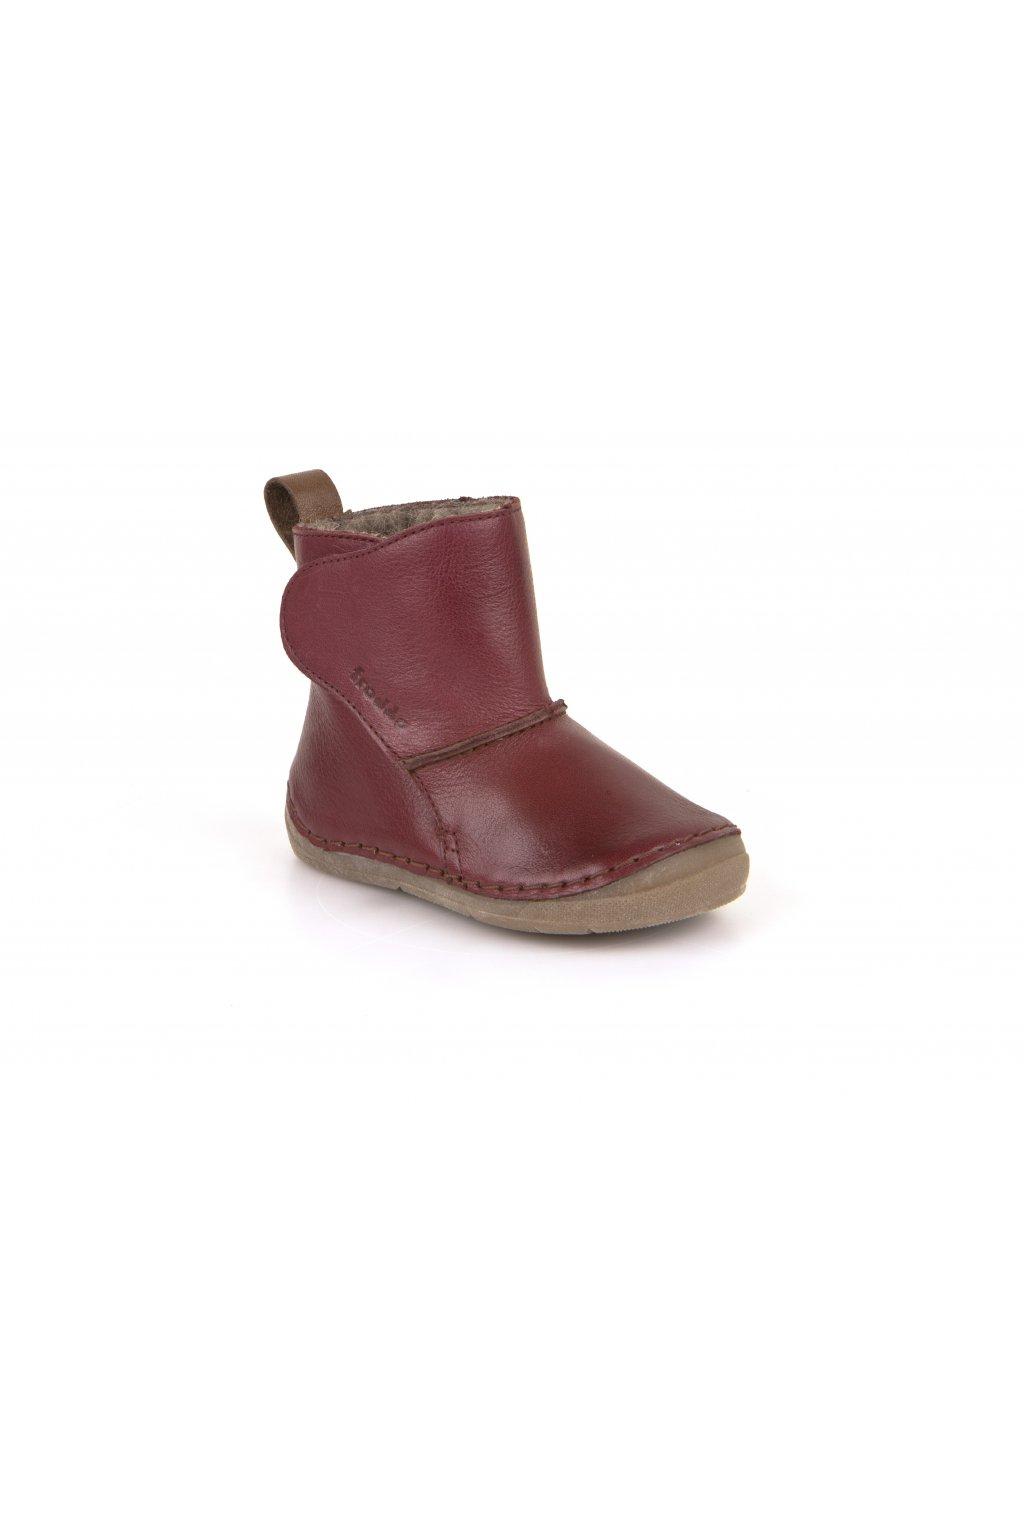 Froddo Boots Bordeaux- Jahňacia Kožušina